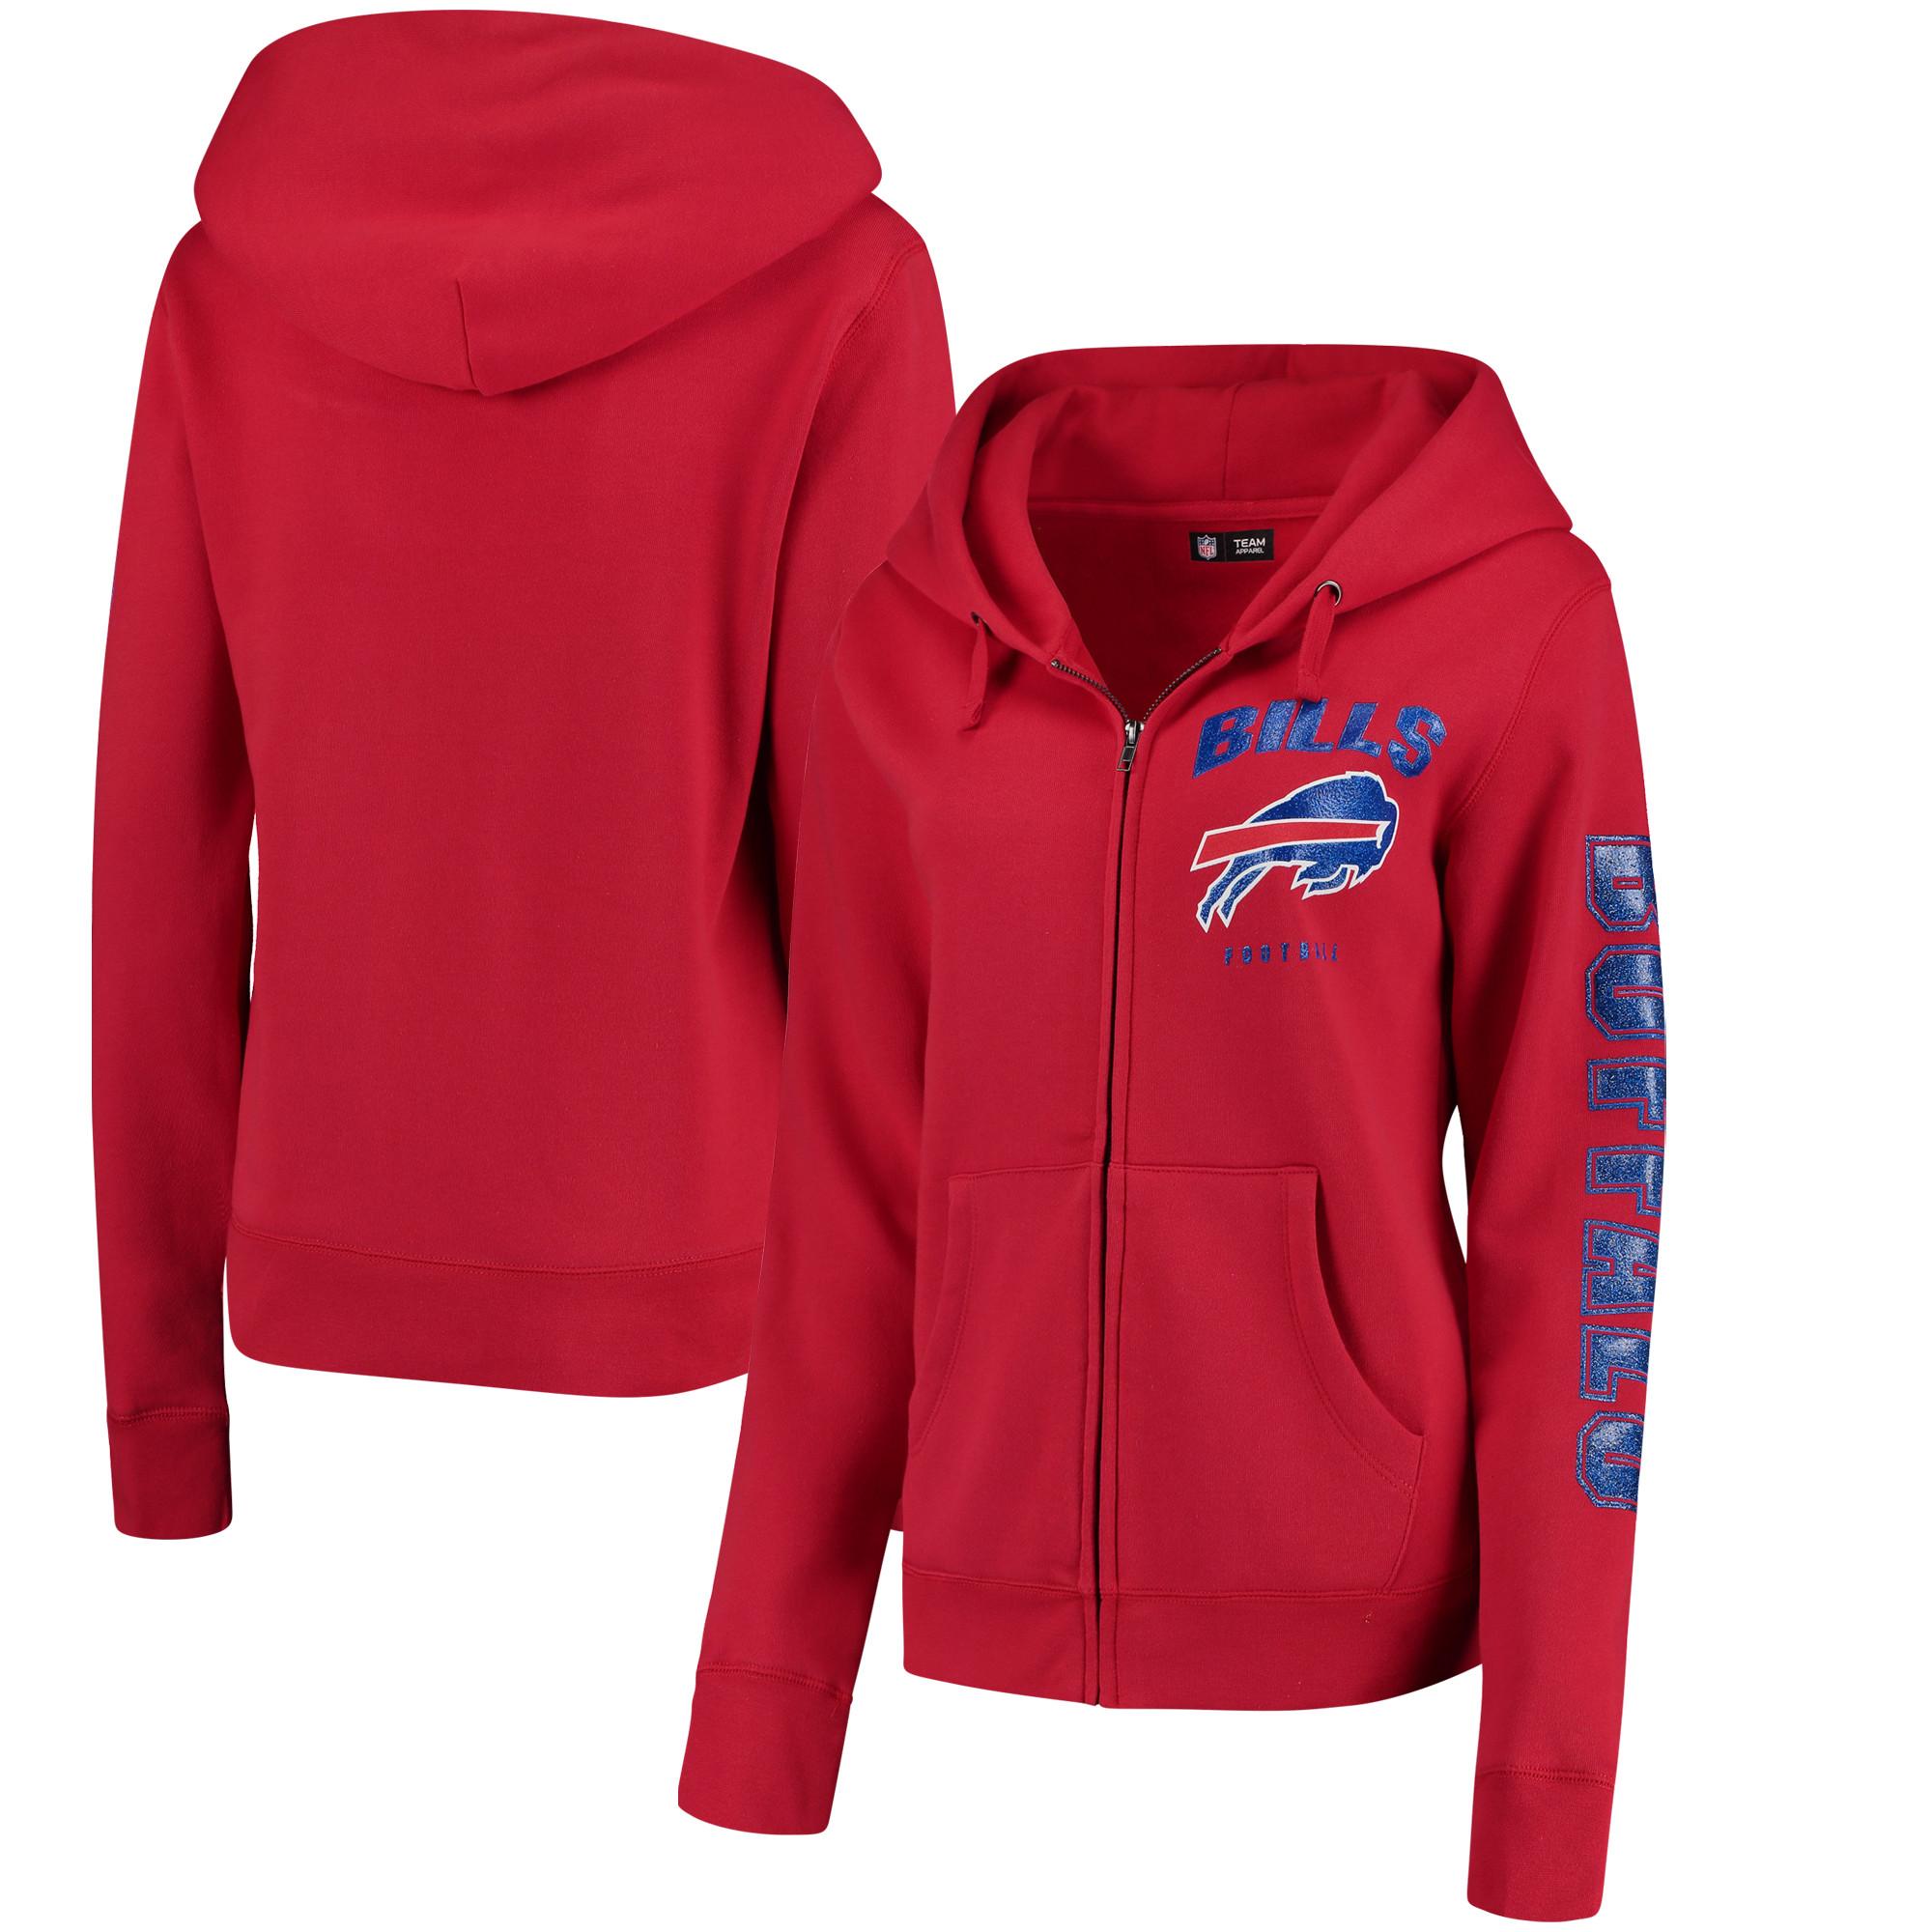 Buffalo Bills New Era Women's Playbook Glitter Sleeve Full-Zip Hoodie - Red